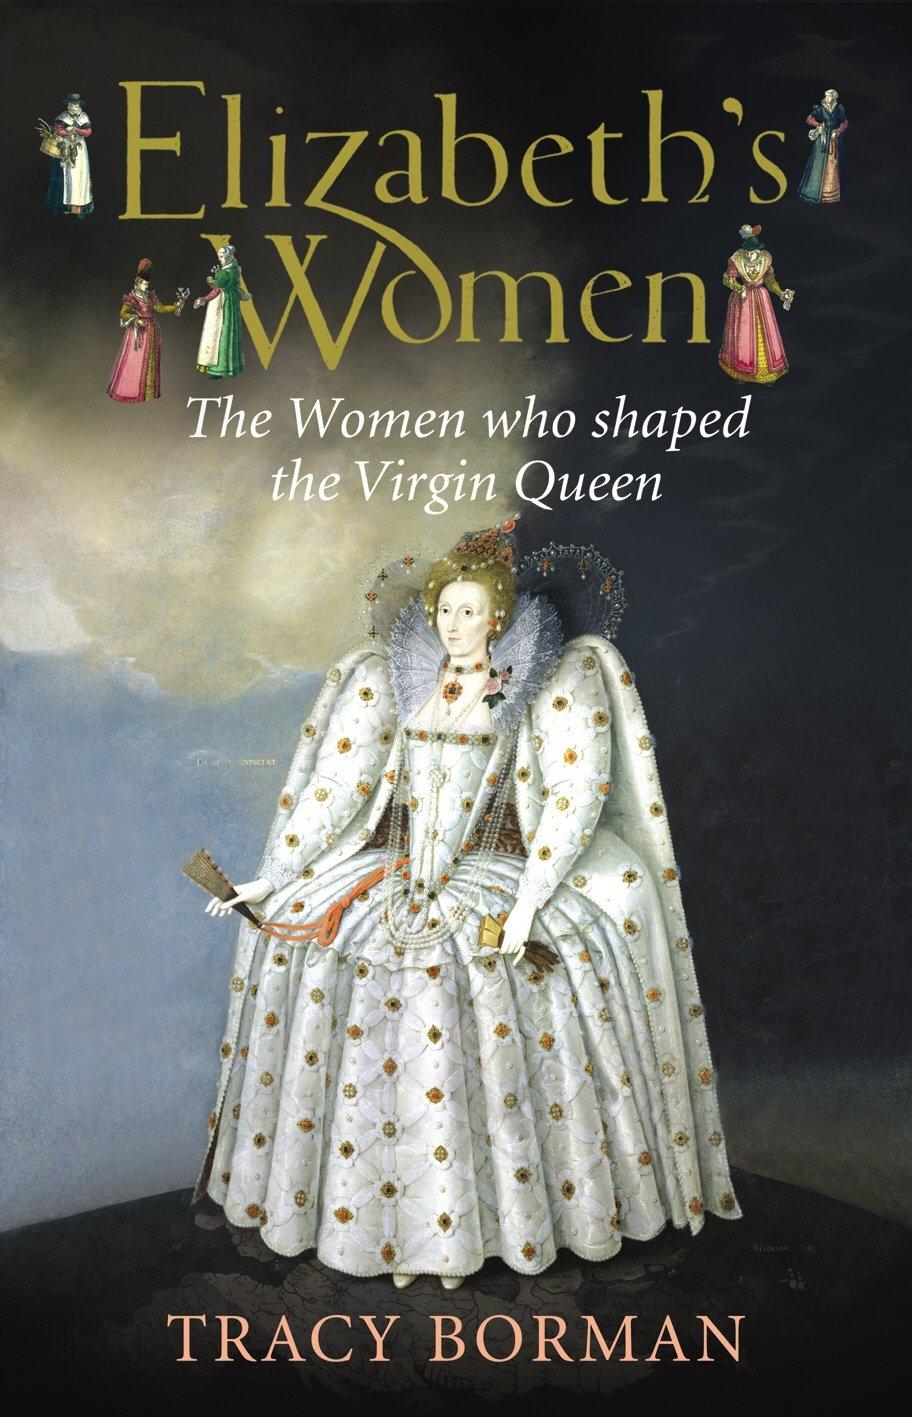 Elizabeths Women The Hidden Story of the Virgin Queen: Tracy Borman:  9780224082266: Amazon.com: Books